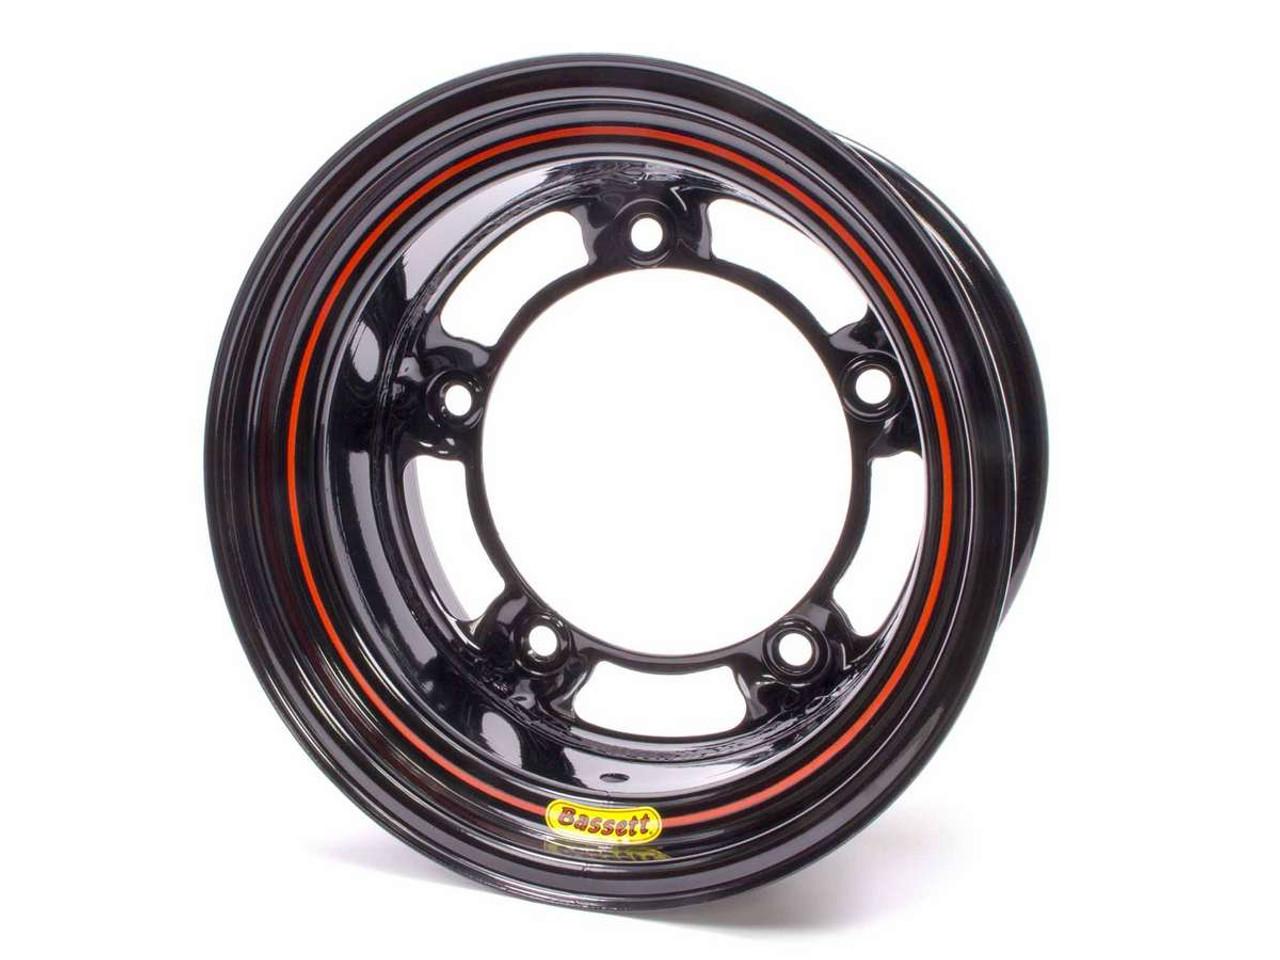 Bassett Racing Wheel 15X8 Wide 5 Powdercoat Black